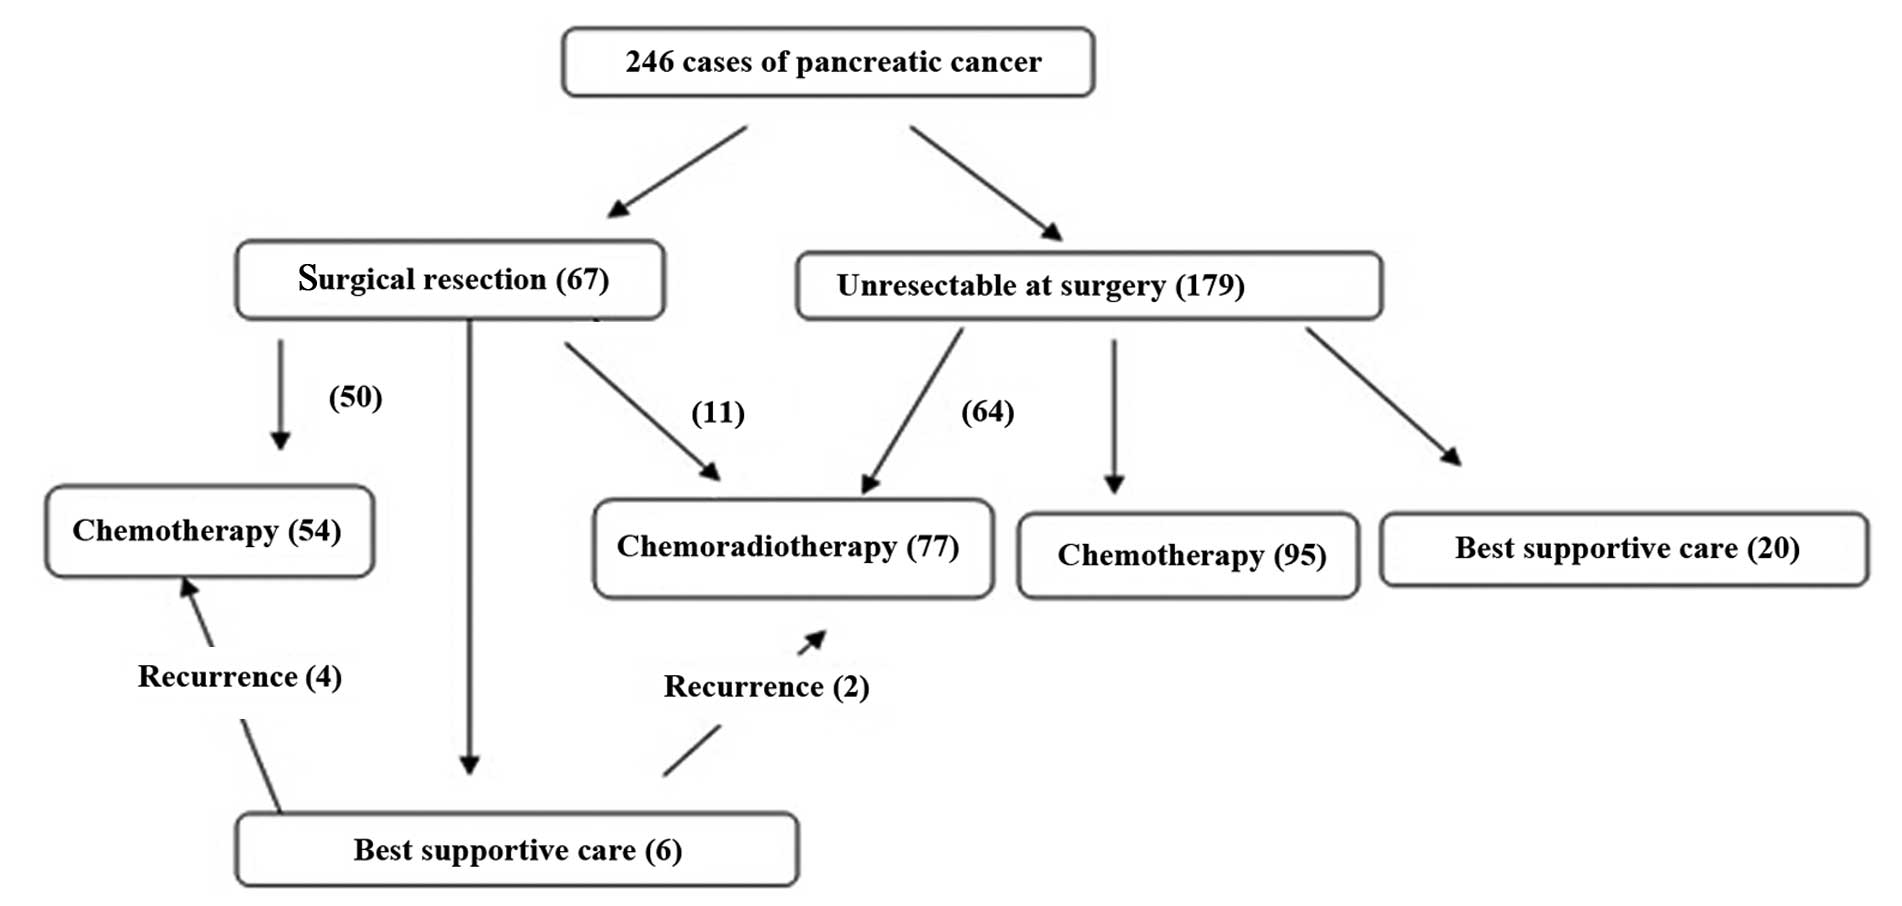 Characteristics of gastrointestinal hemorrhage associated